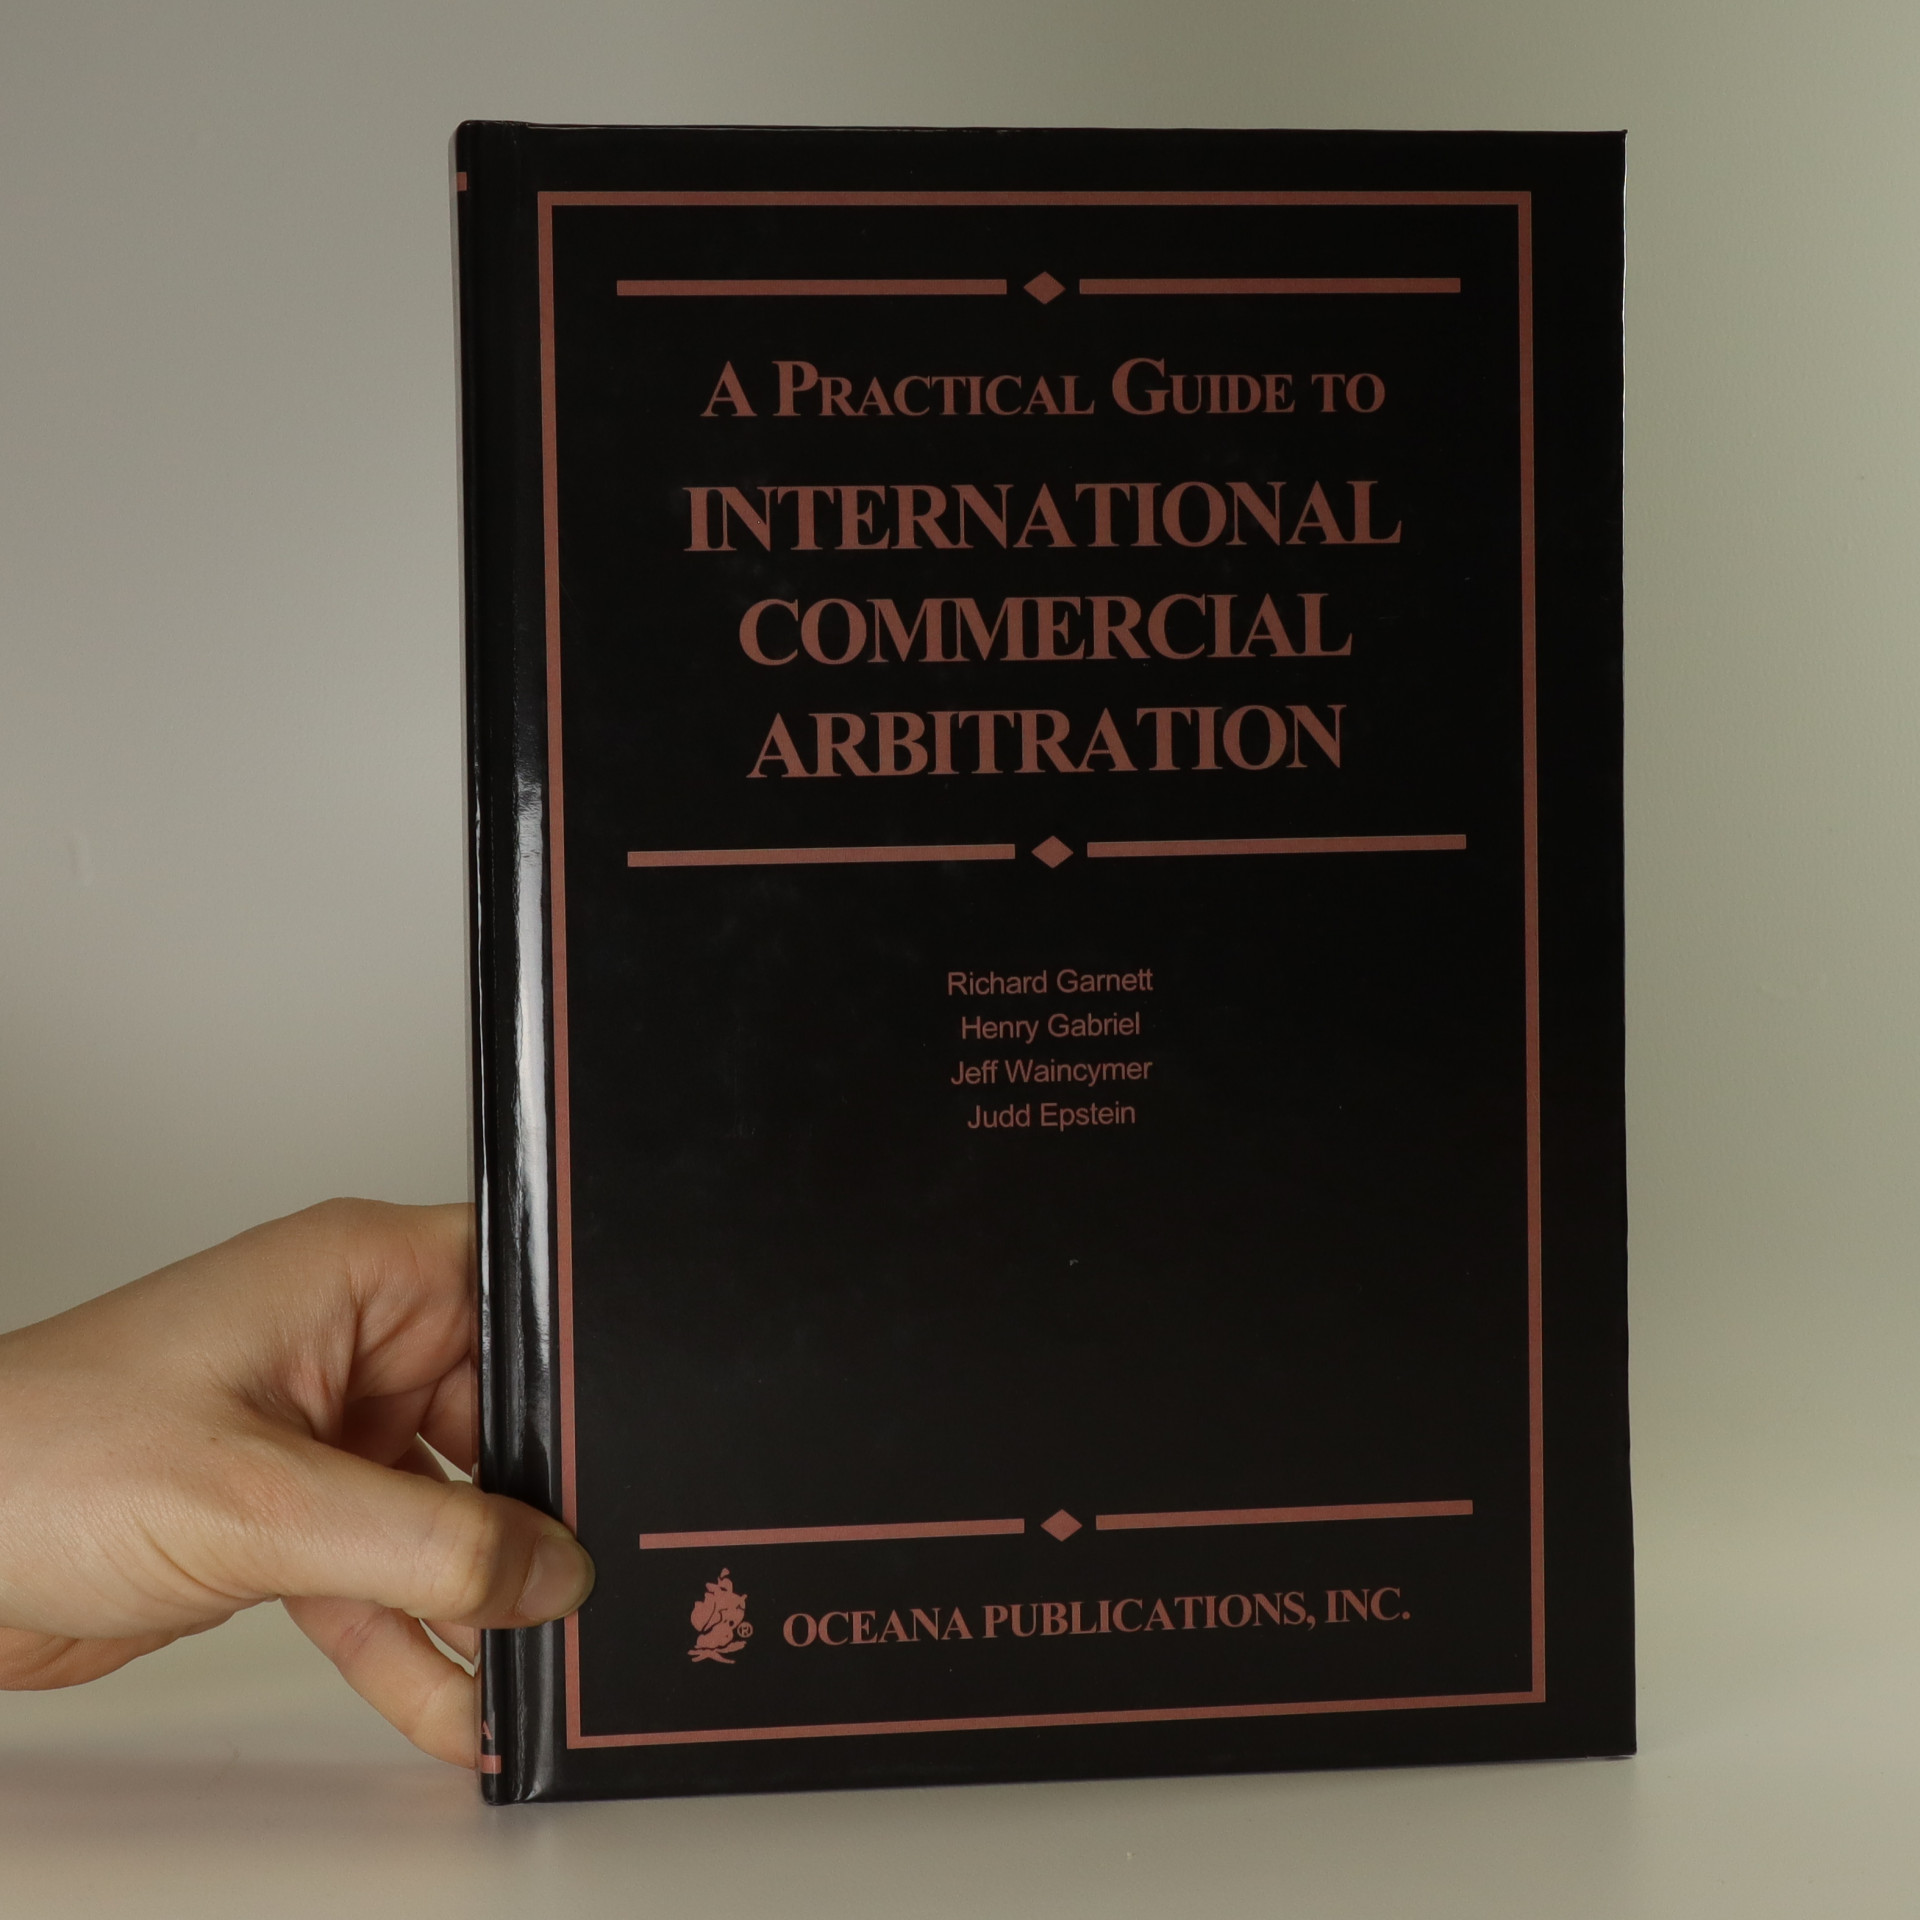 antikvární kniha A practical guide to international commercial arbitration, neuveden